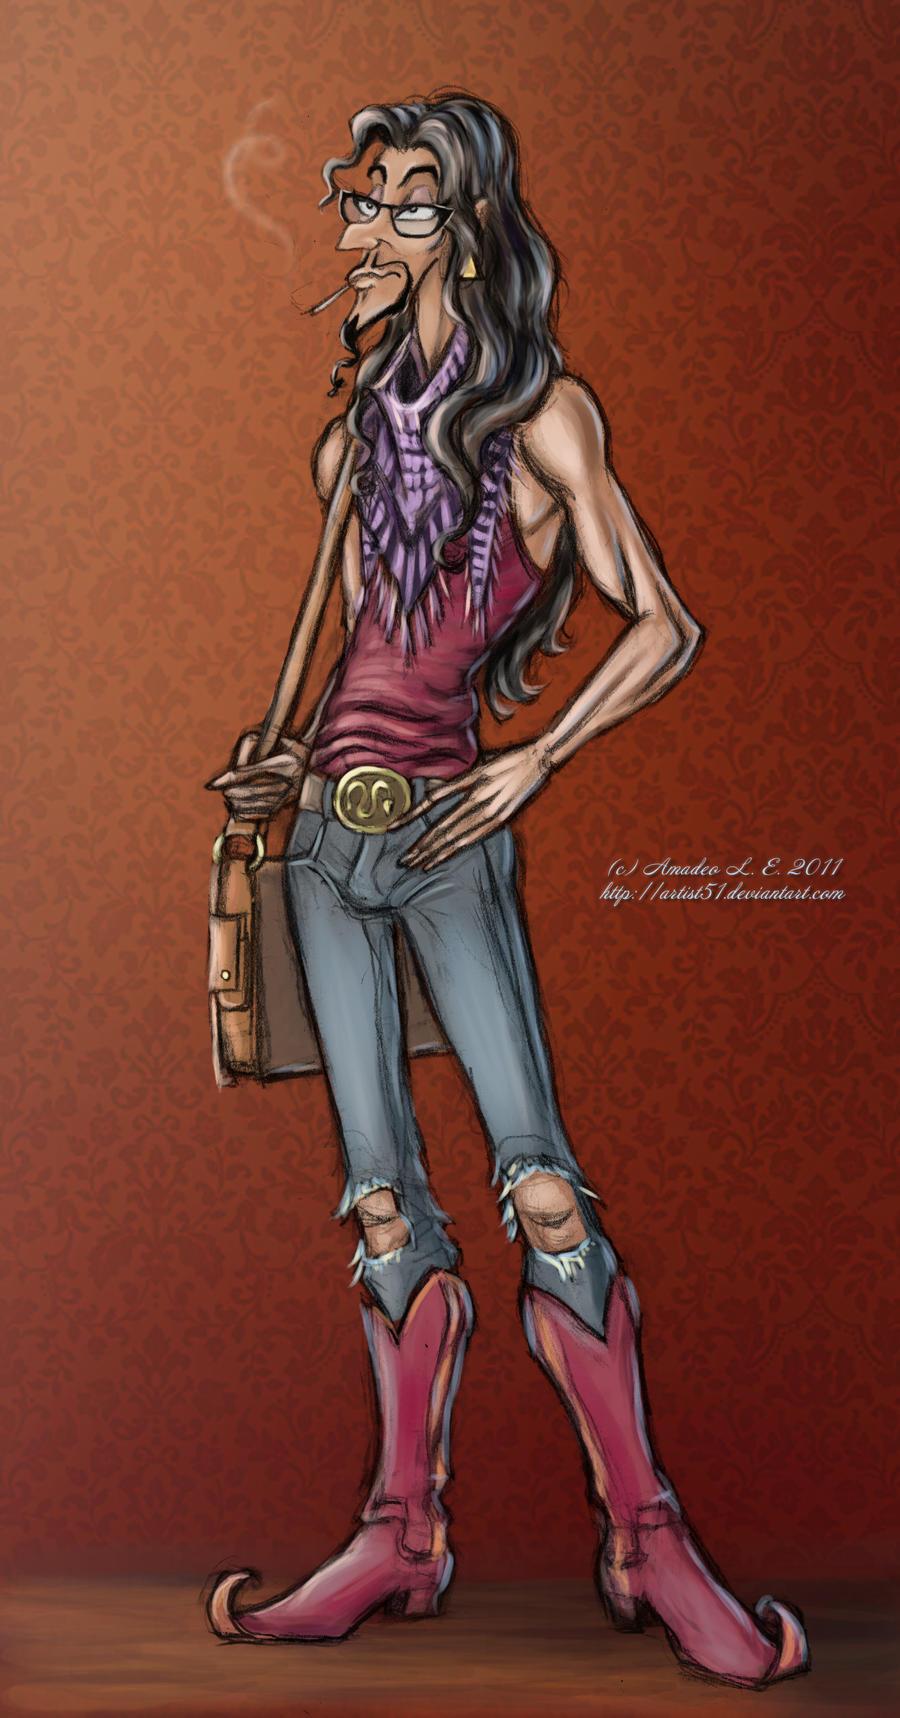 Jafar Modern_jafar_full_body_by_artist51-d4girr4